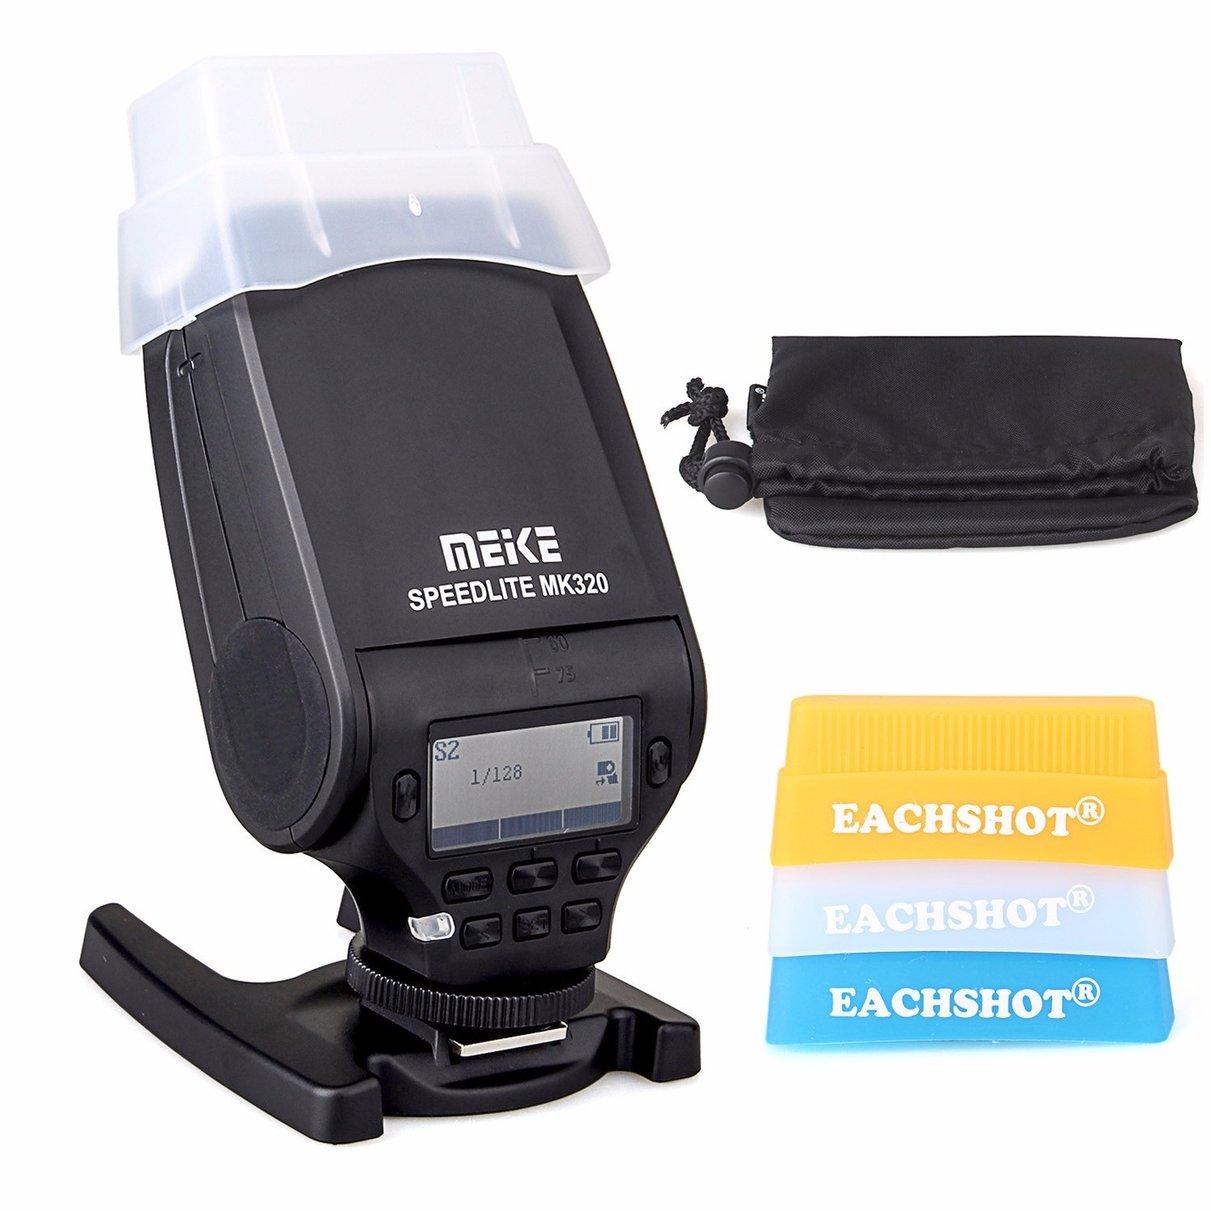 MEIKE MK-320 I-TTL HSS Κύρια πτώση Speedlite για Nikon D3400 D5300 D7200 D750 D5600 D3200 D7100 D3300 D7200 D850